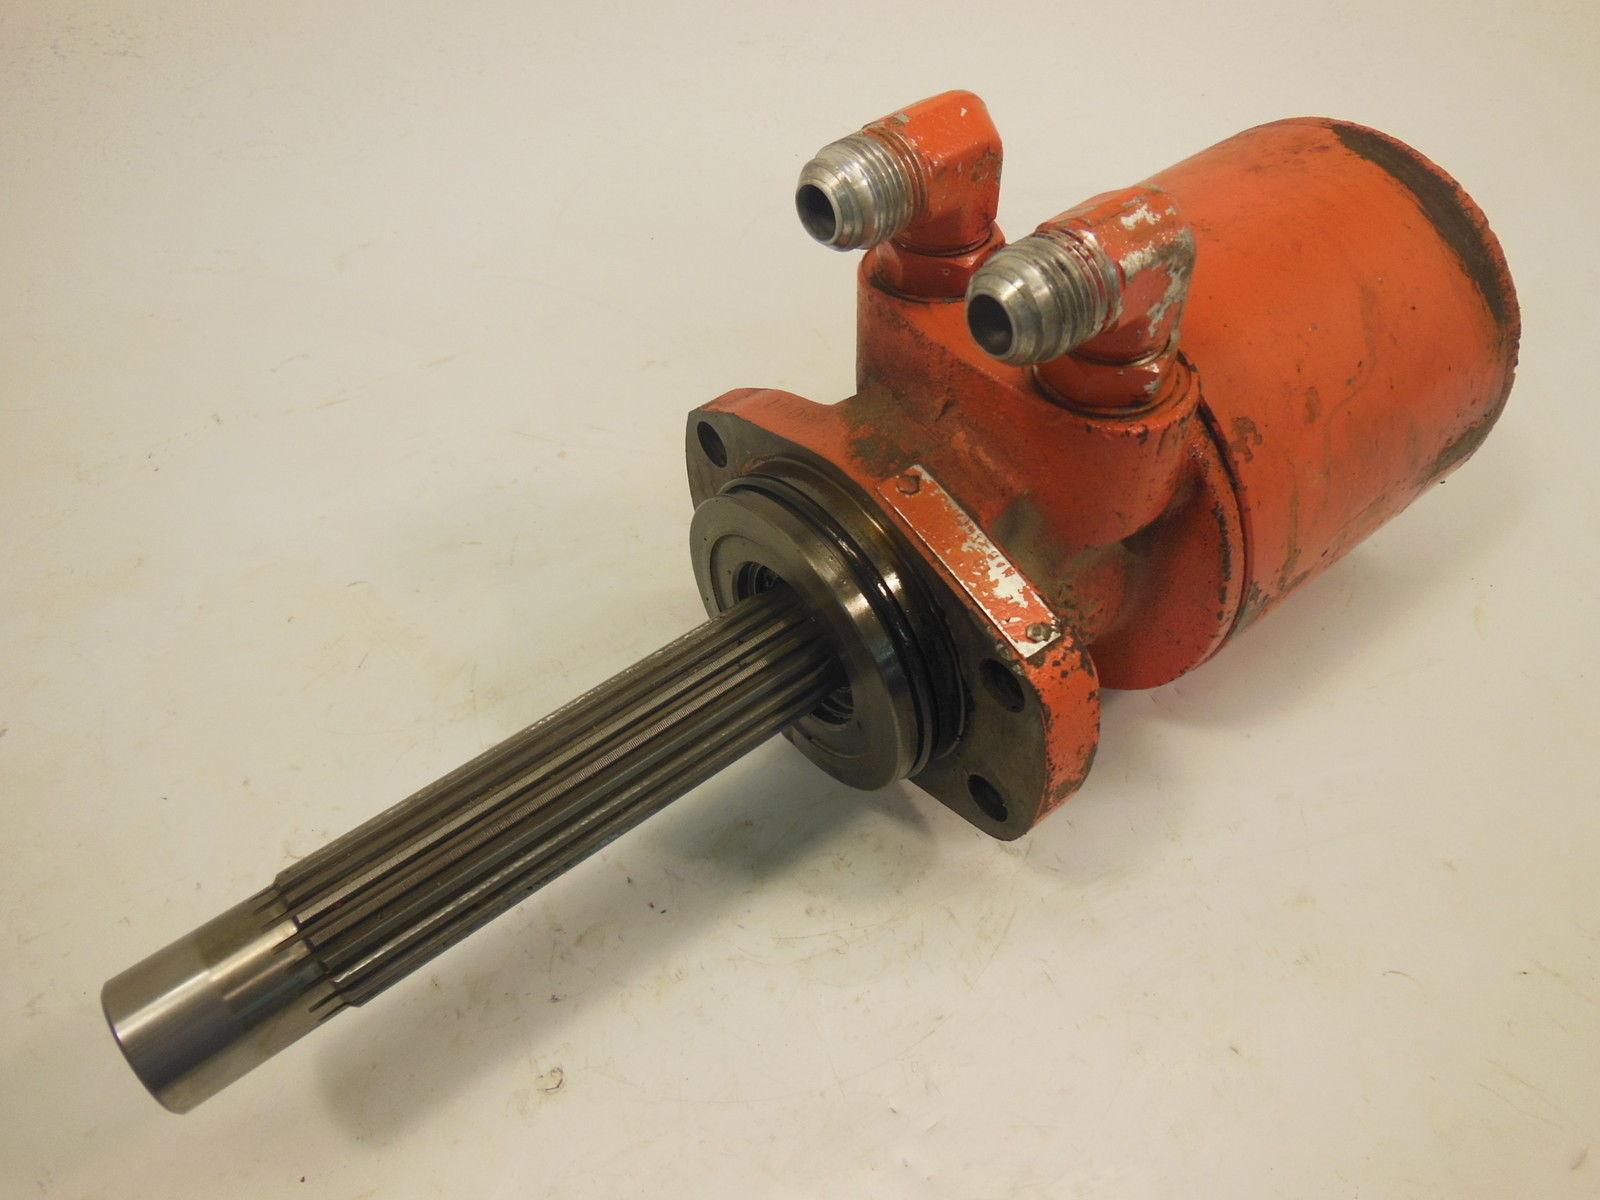 Case Garden Tractor Hydraulic Pump : Case lawn tractor hydraulic pump motor good shape